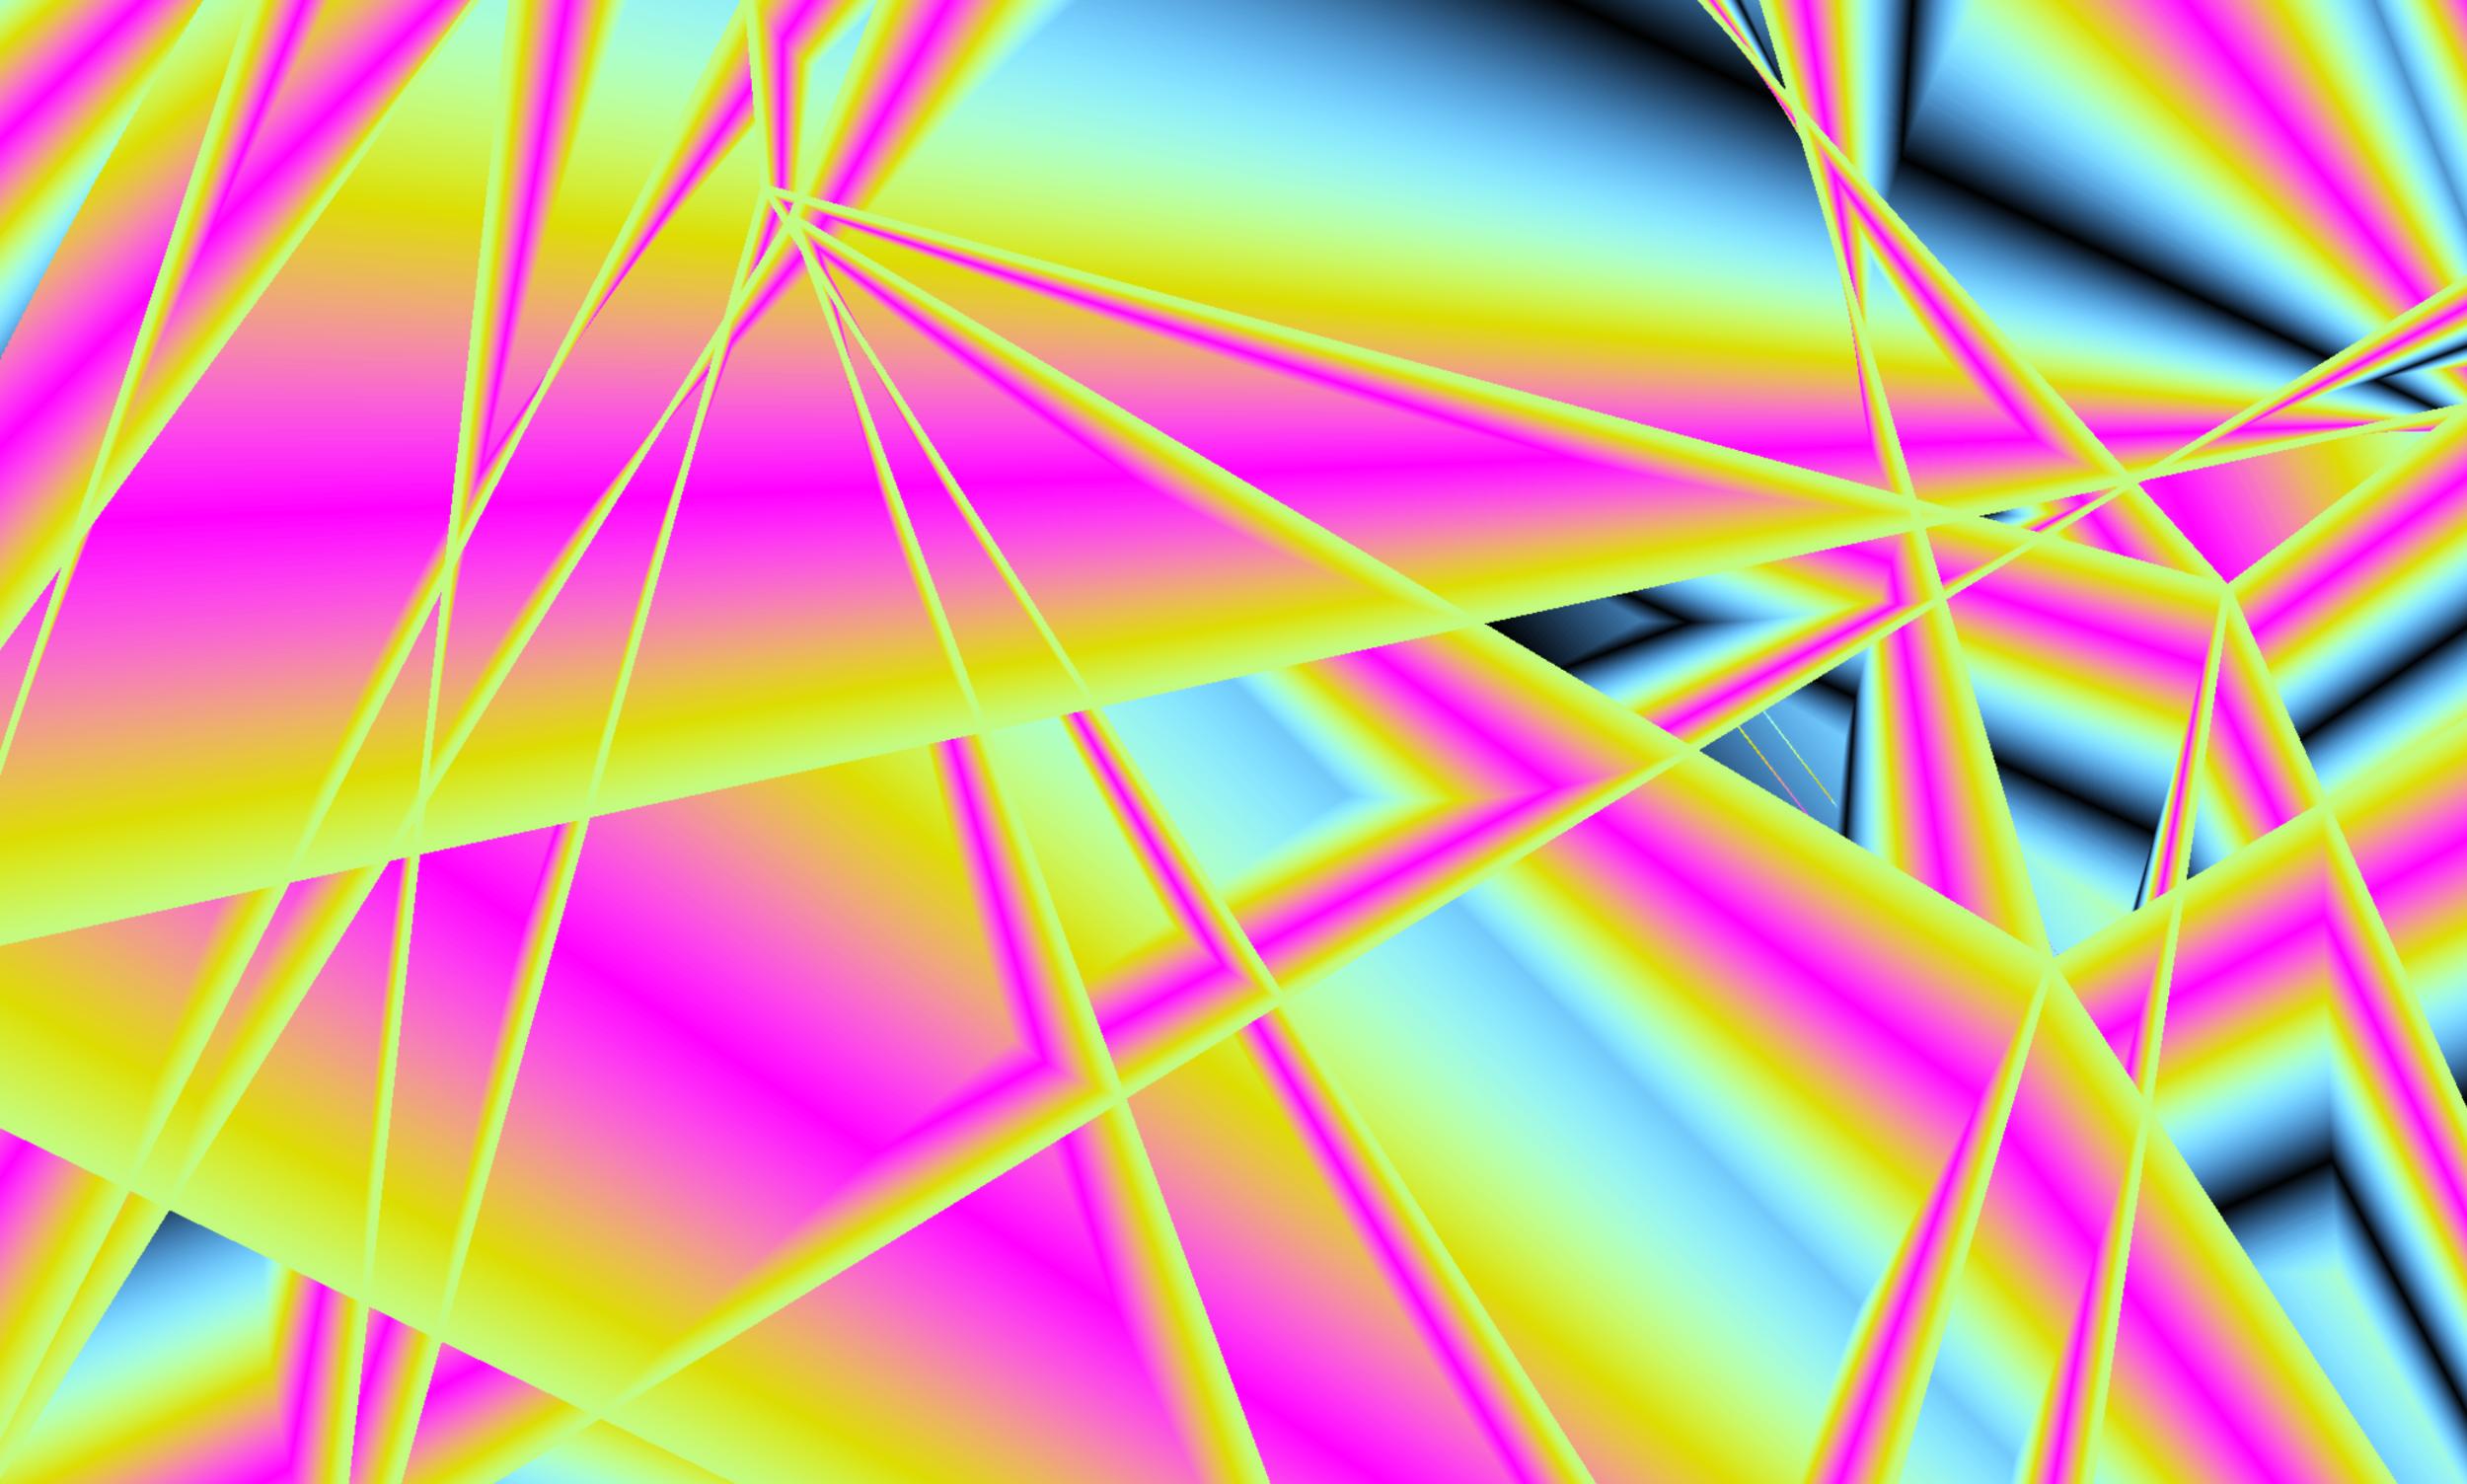 screenshot-0064.png